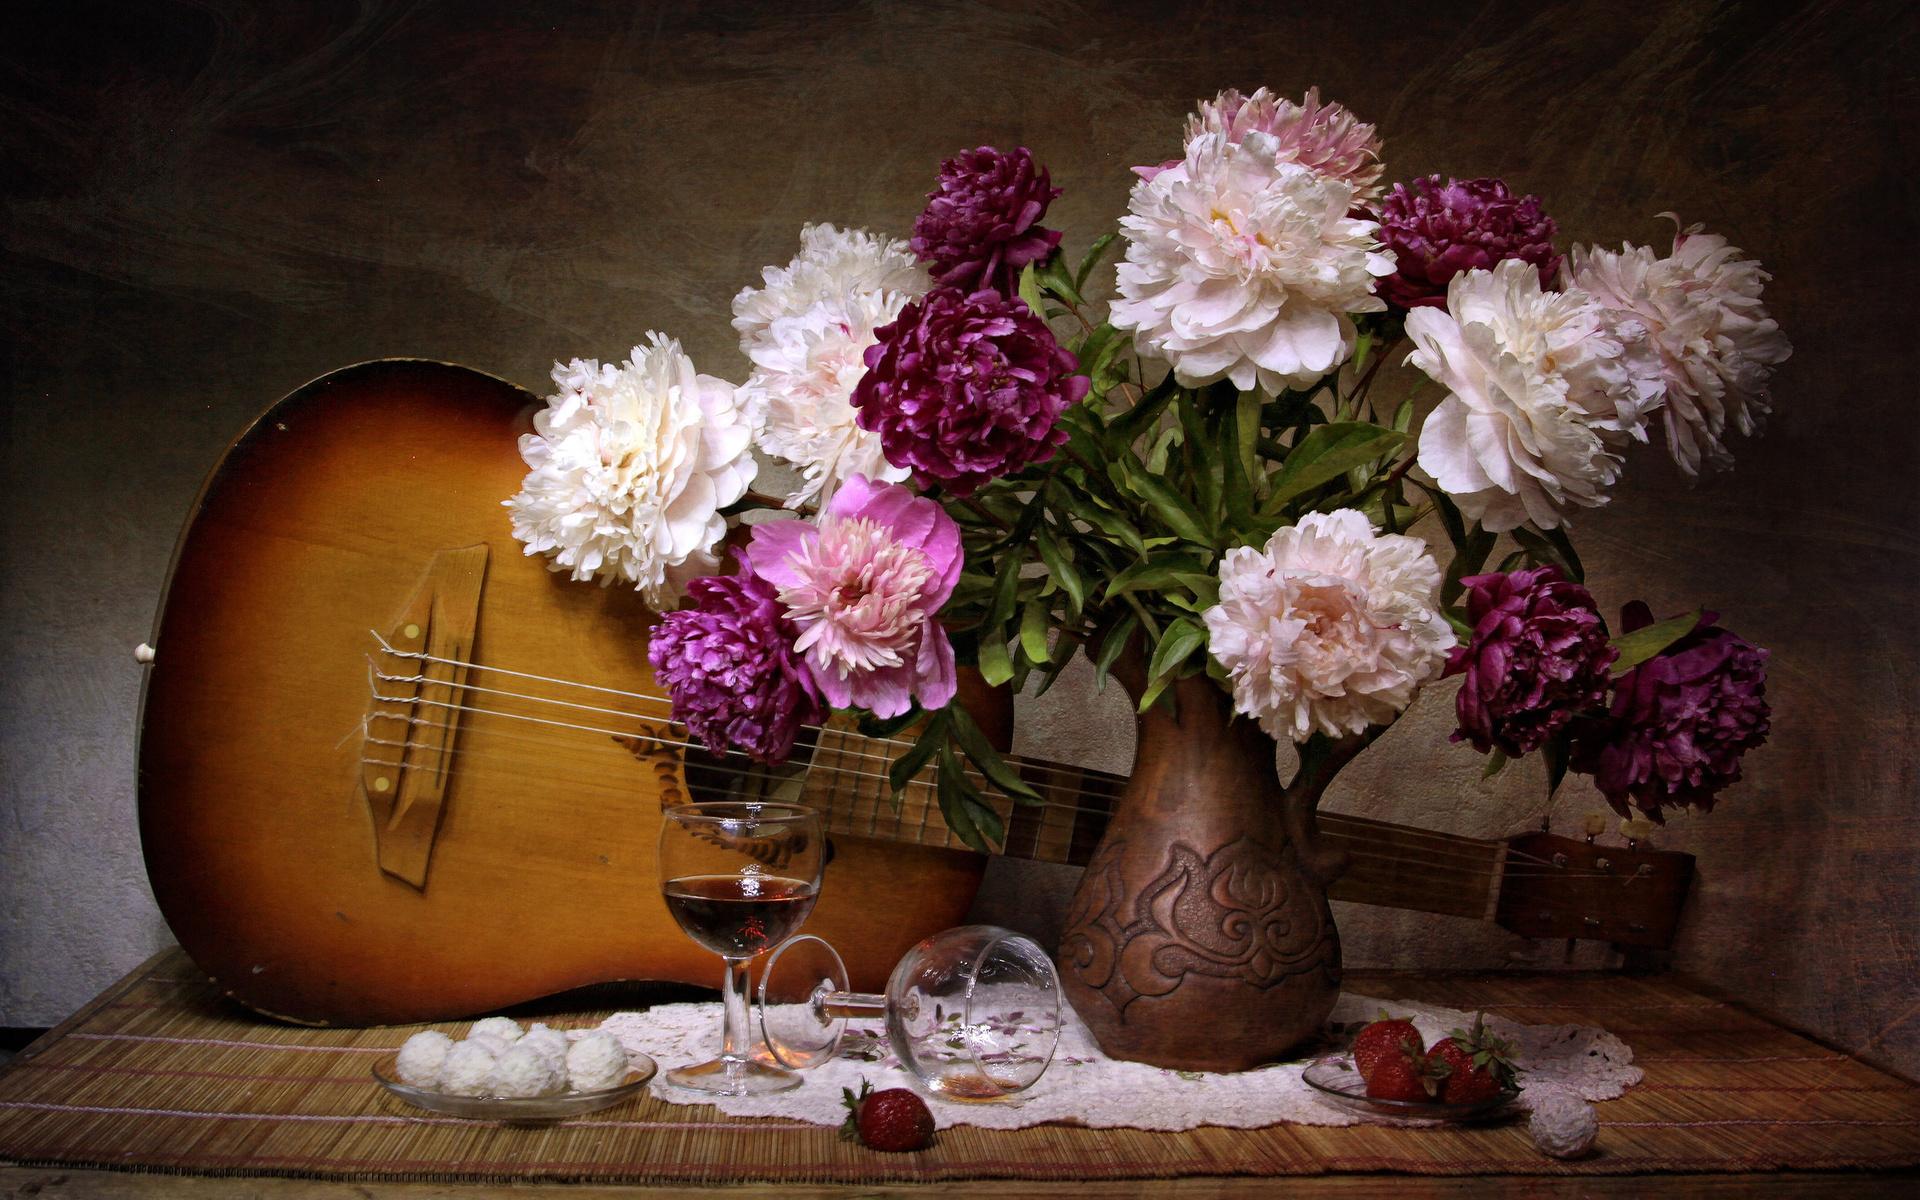 салфетка, ваза, цветы, пионы, натюрморт, гитара, бокалы, блюдце, ягоды, клубника